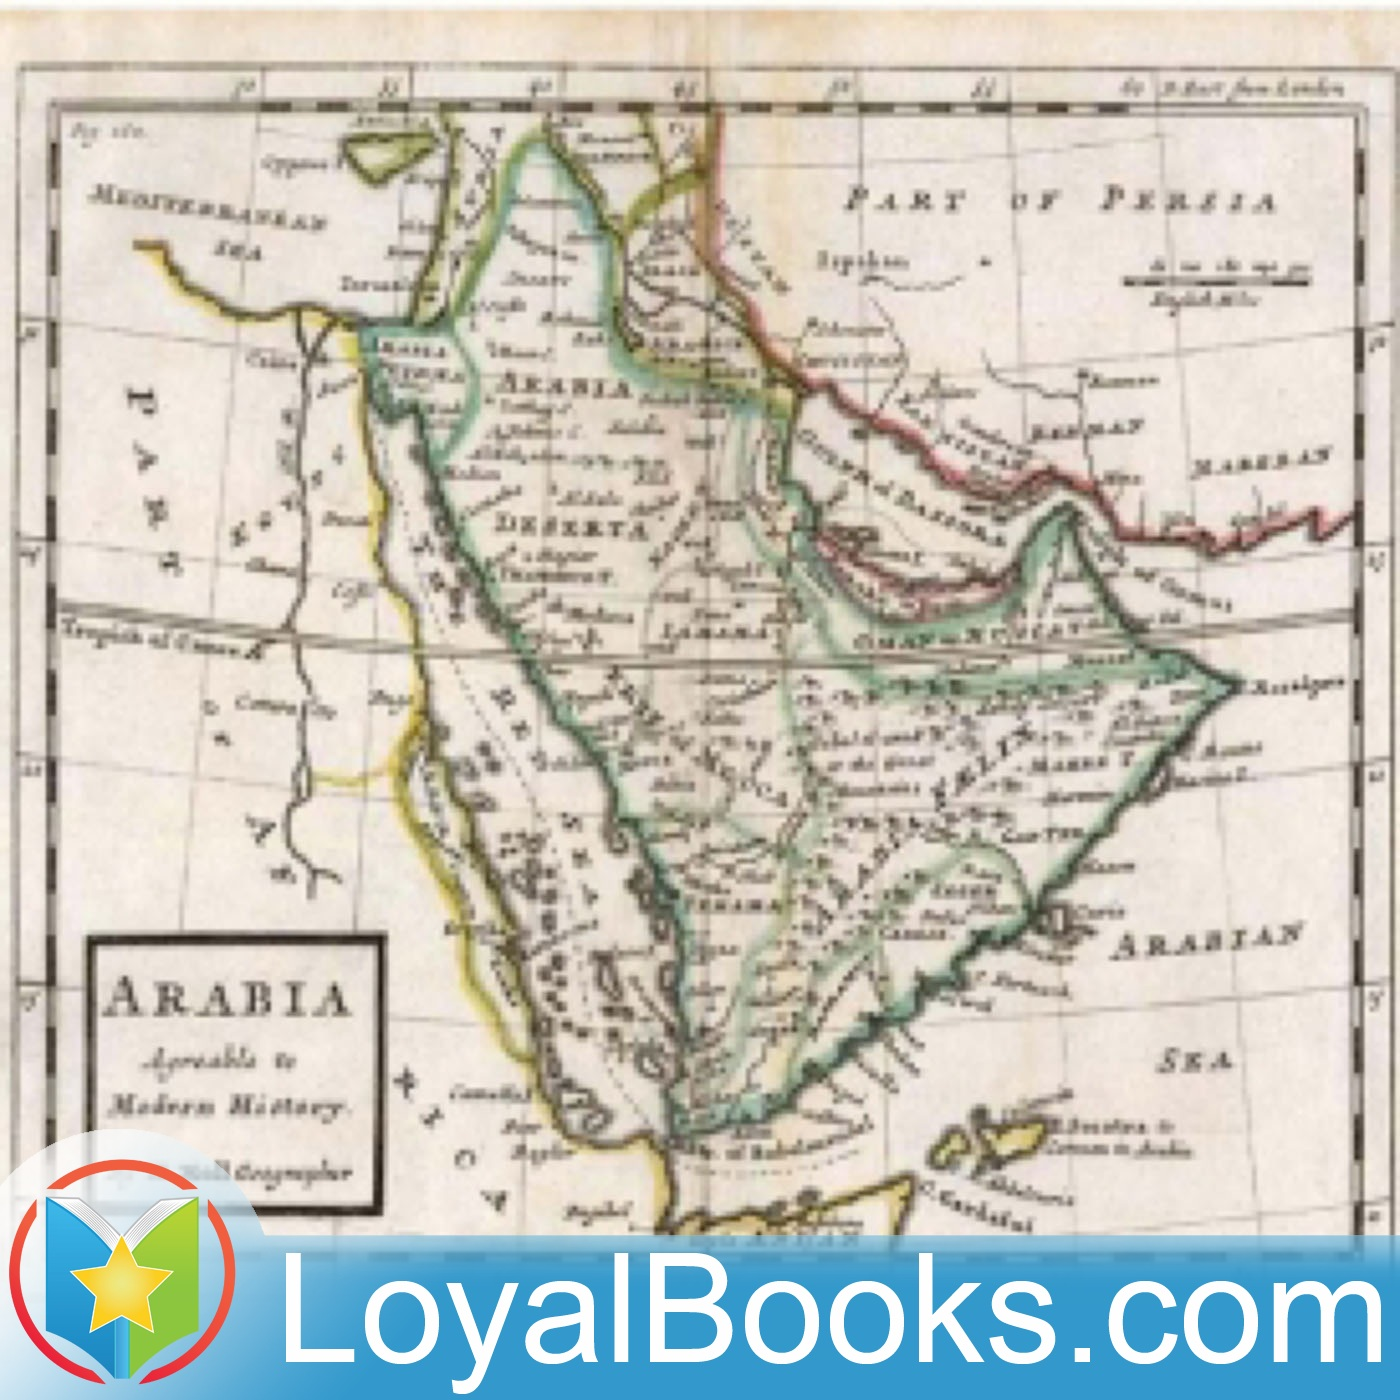 <![CDATA[Arabic Primer by Sir Arthur Cotton]]>